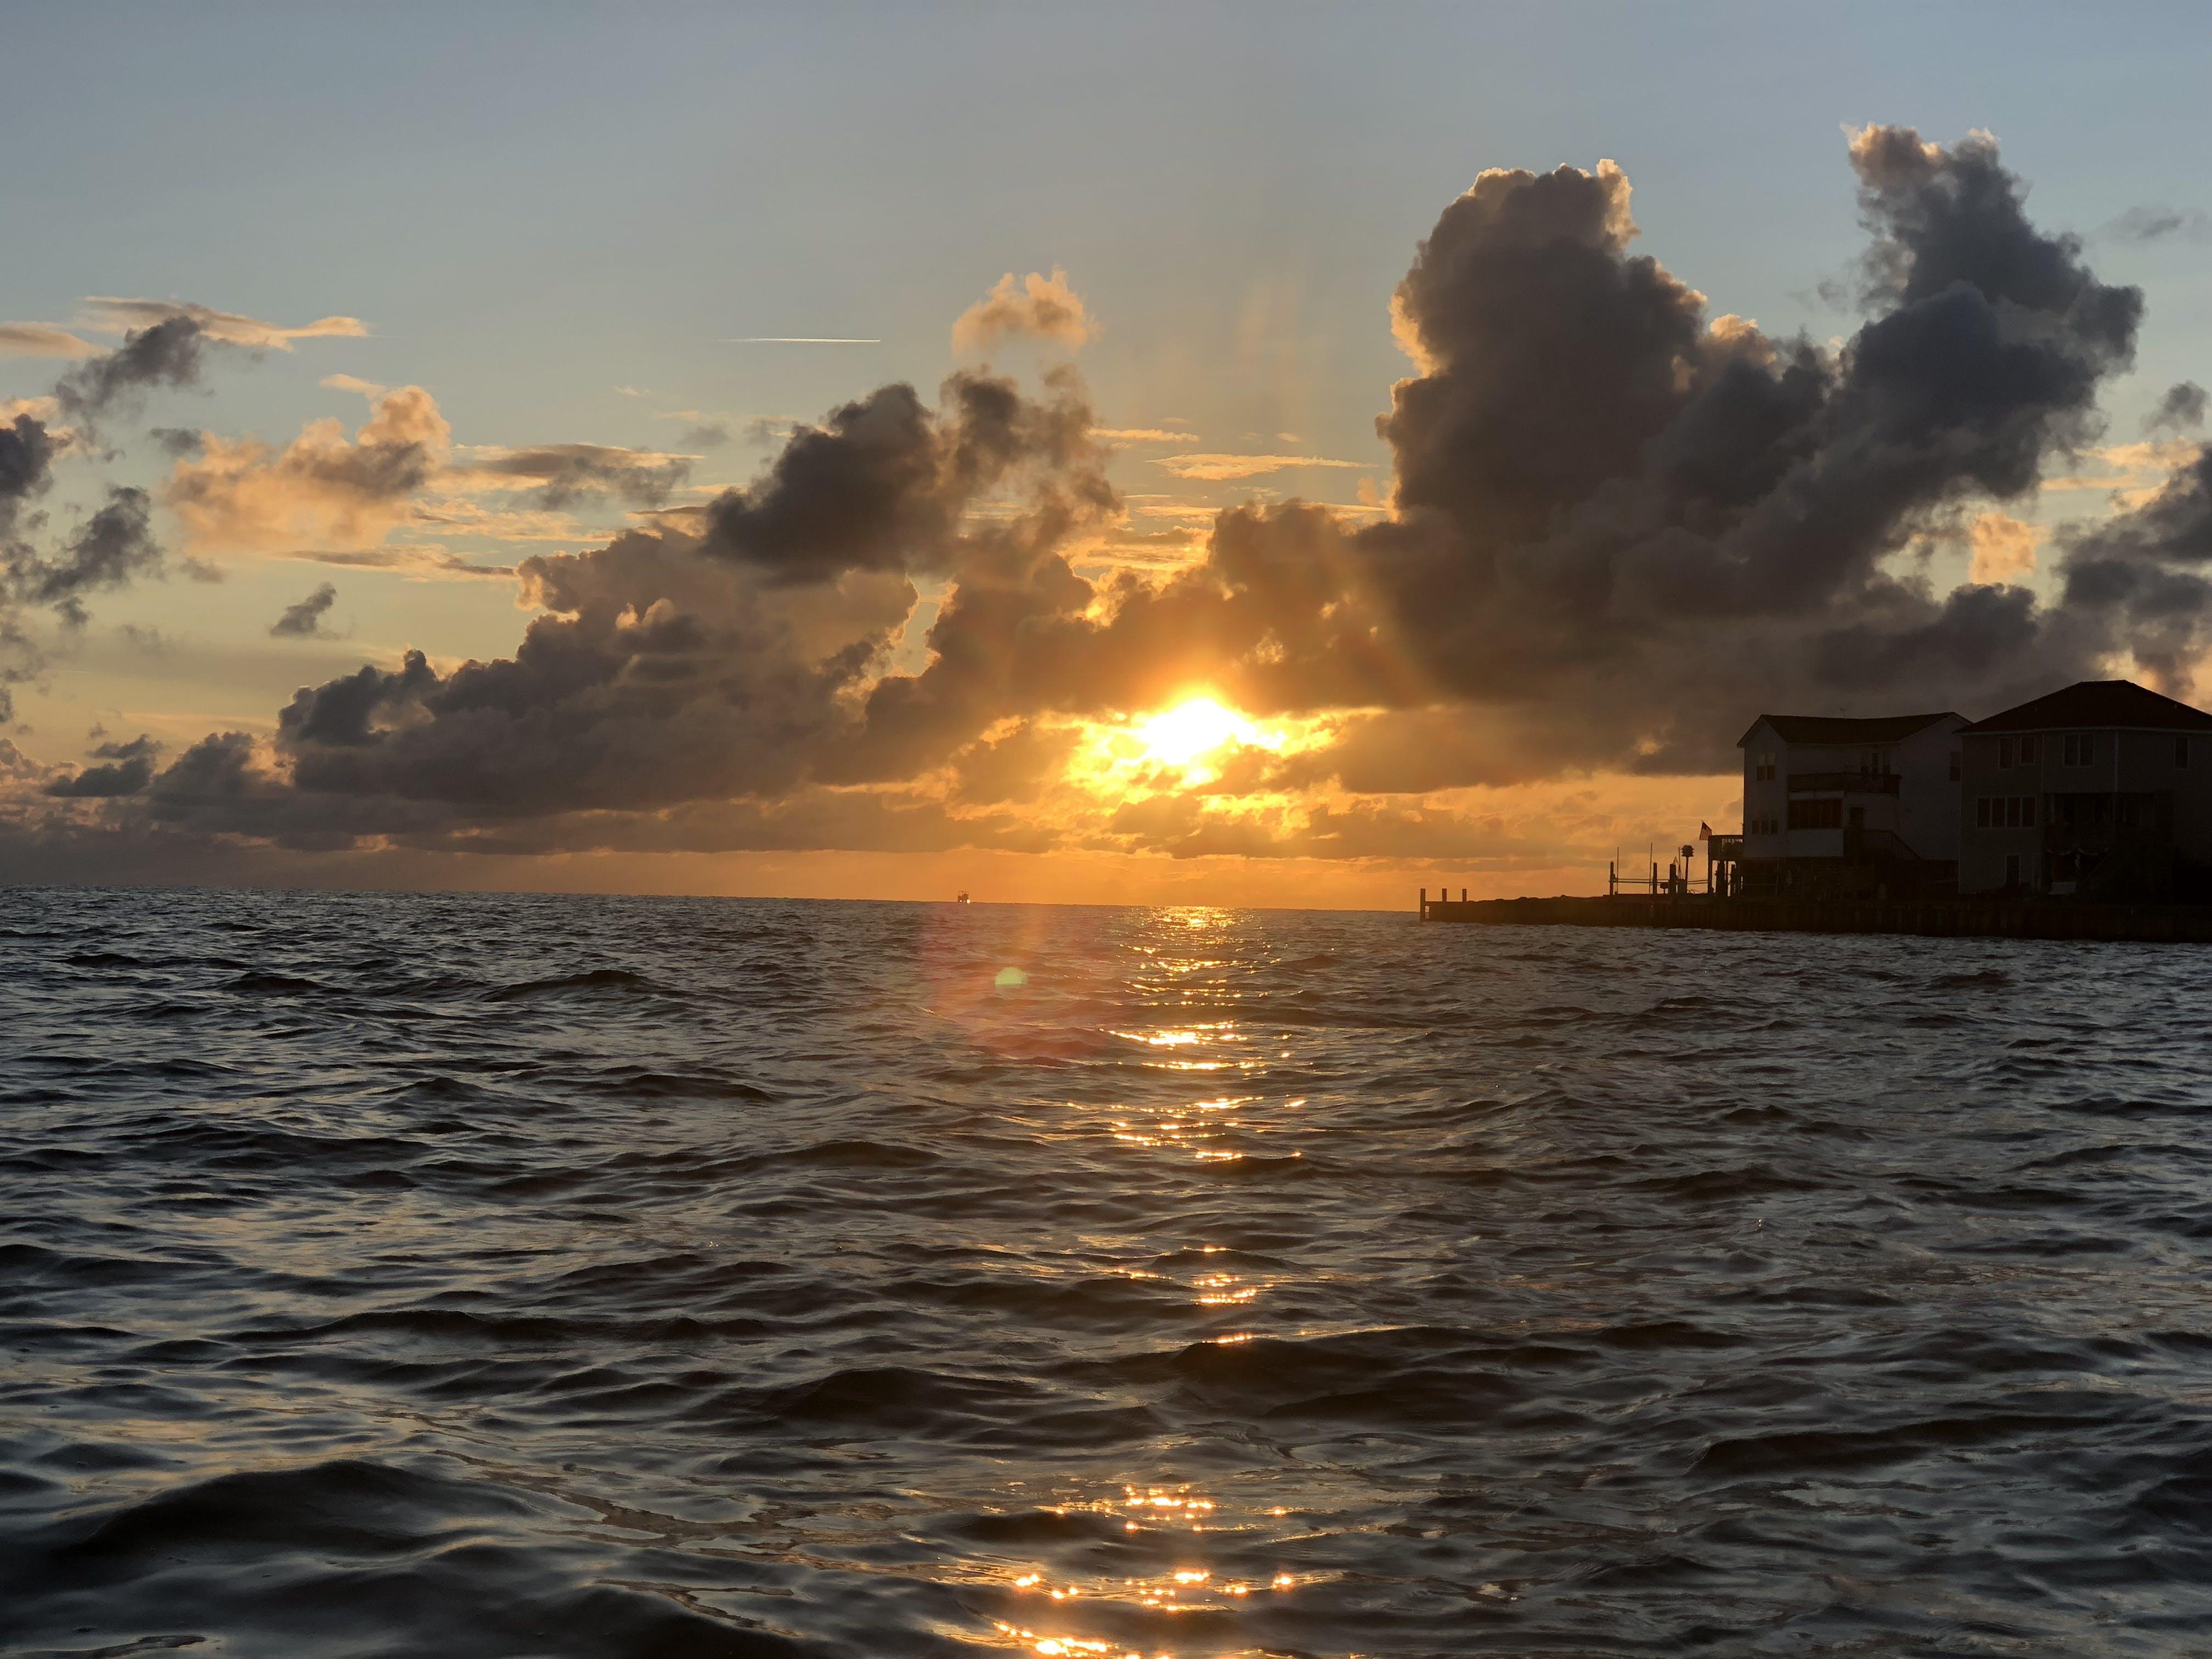 Free stock photo of ray of sunshine, evening sun, golden sunset, Water view